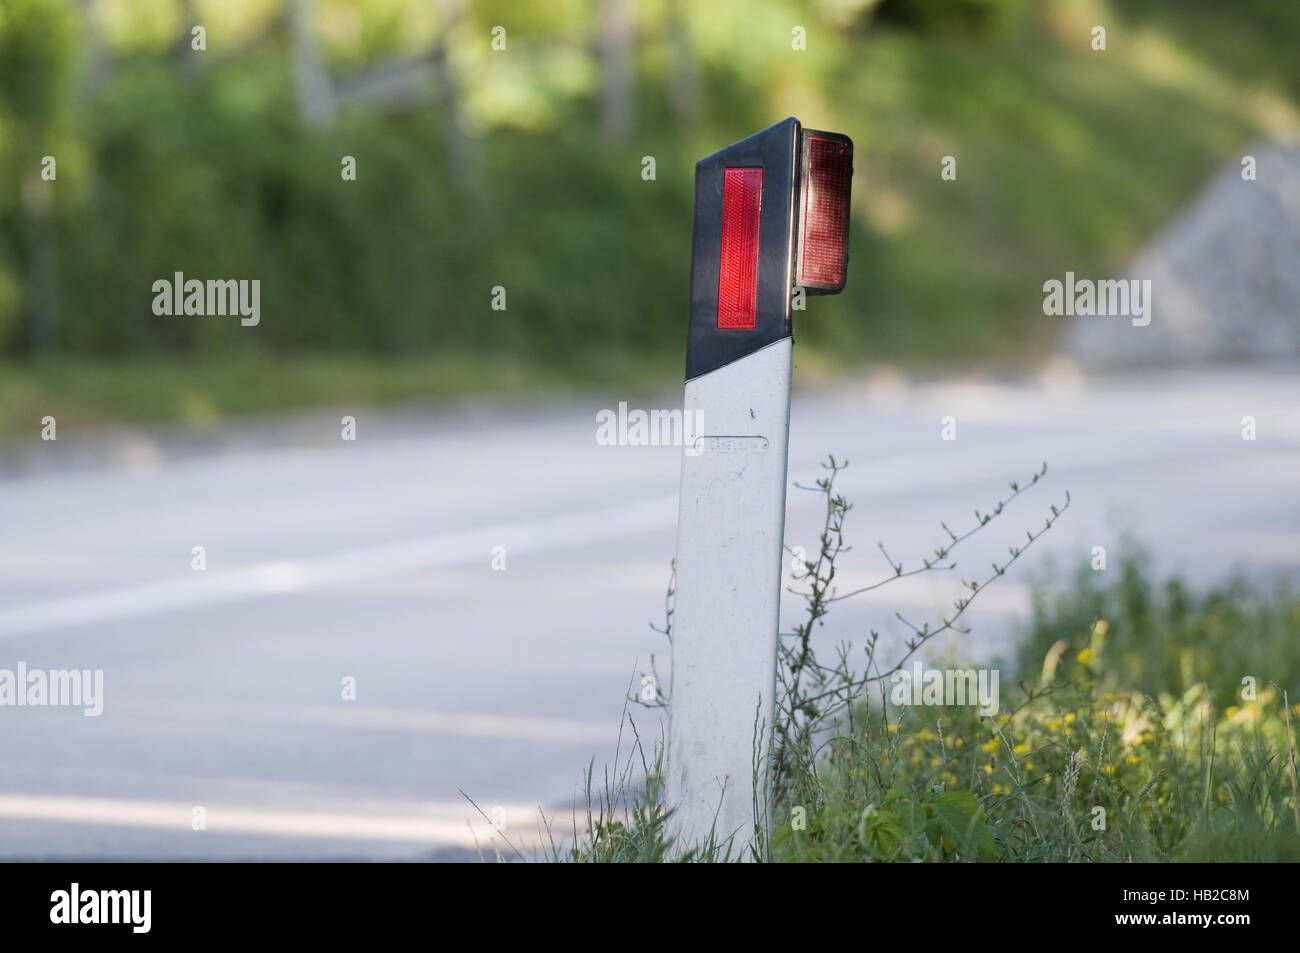 Begrenzungspfosten an der Straße-horizontal Stock Photo